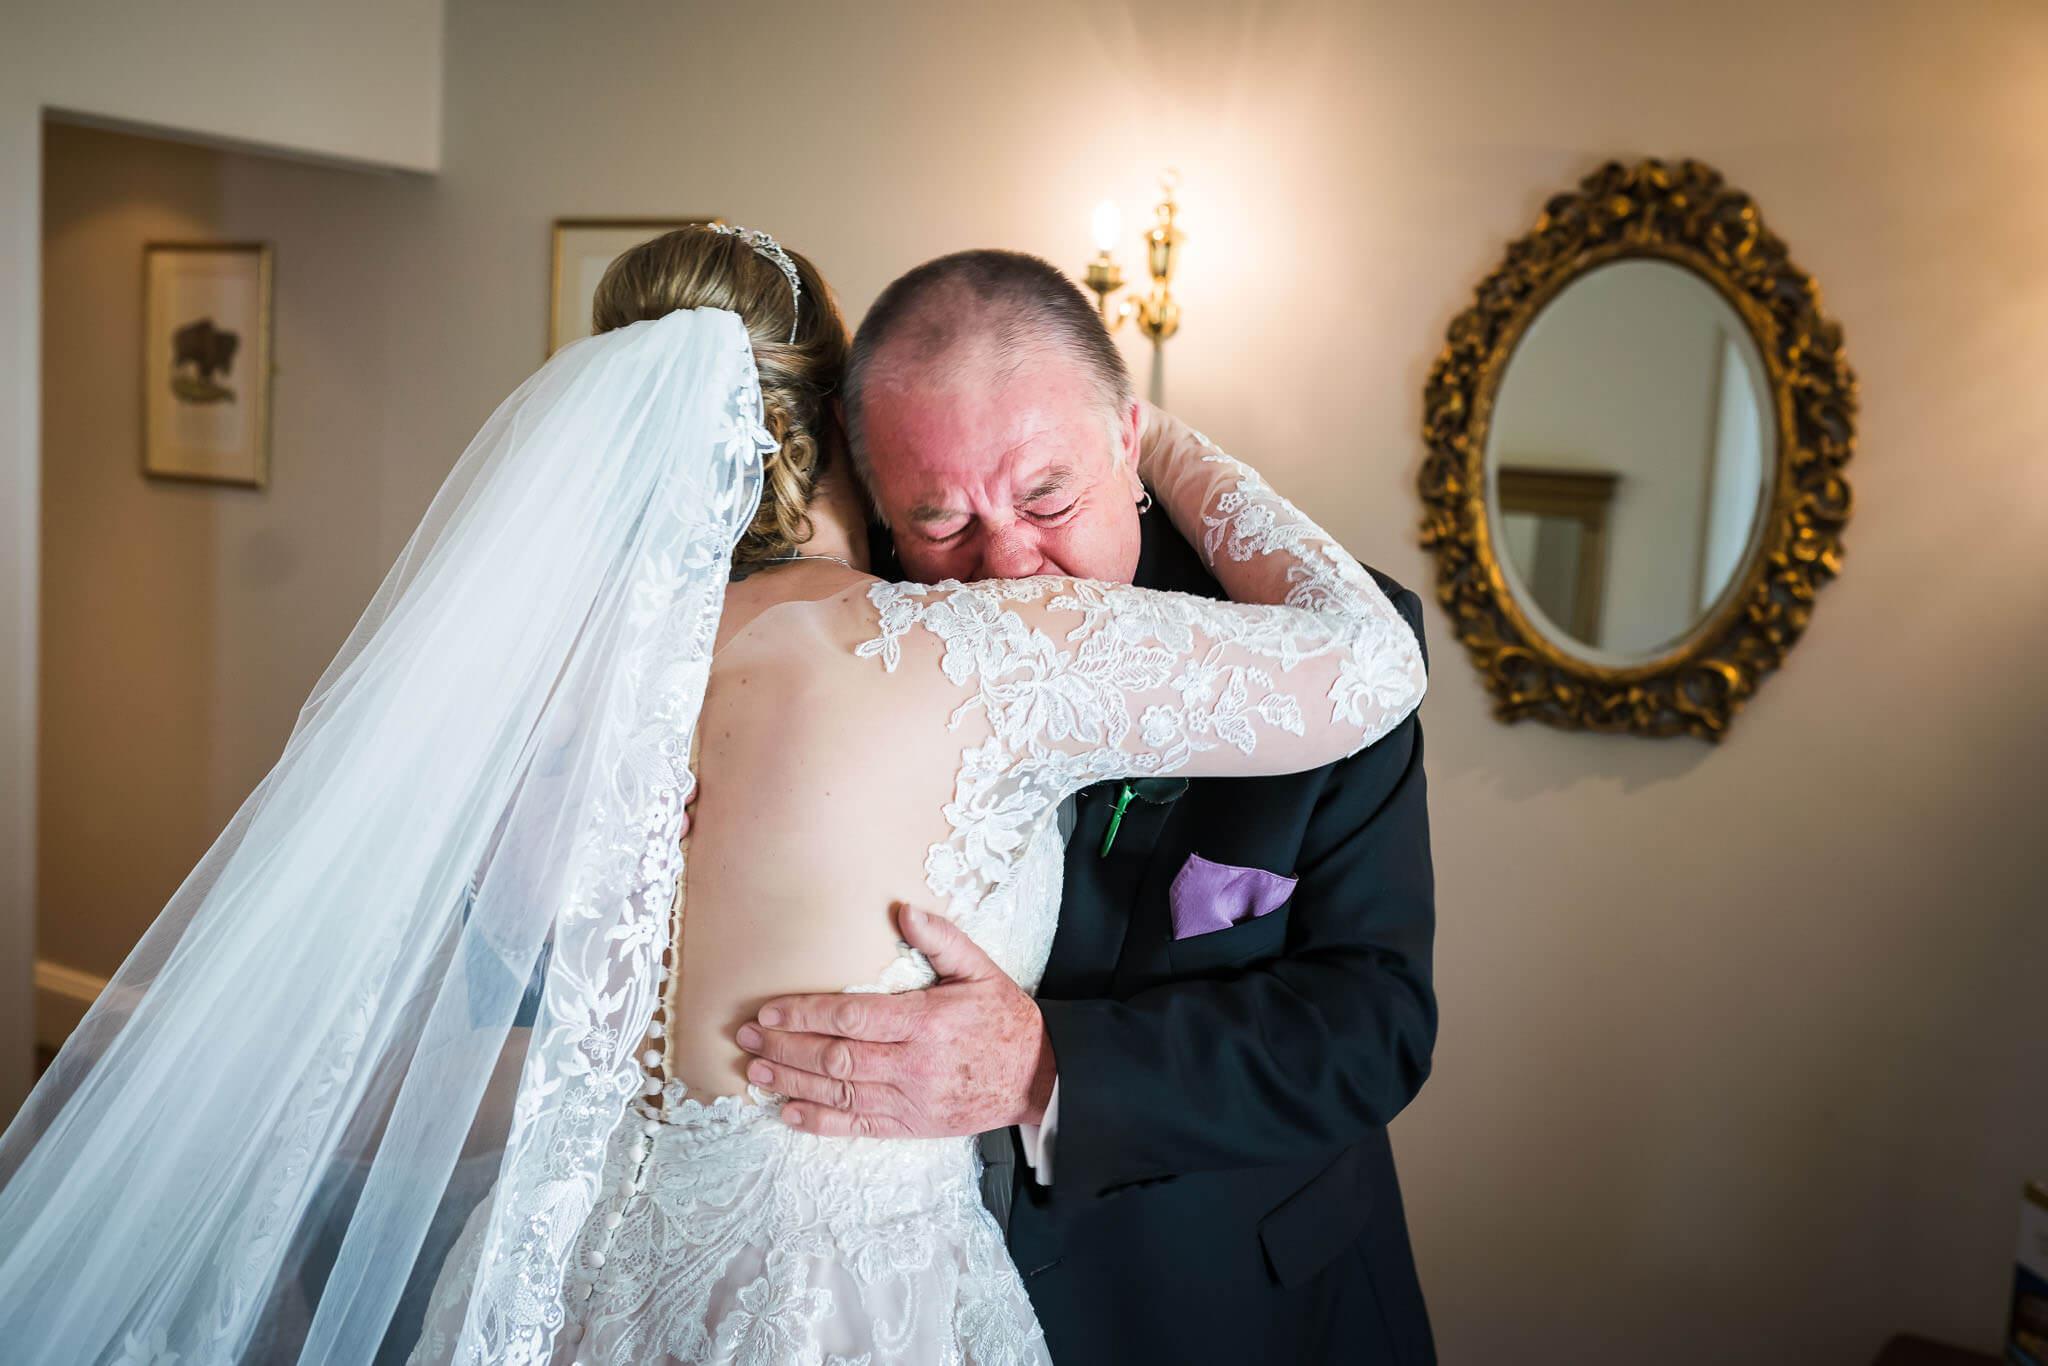 bristol-and-somerset-wedding-photographer-26.jpg